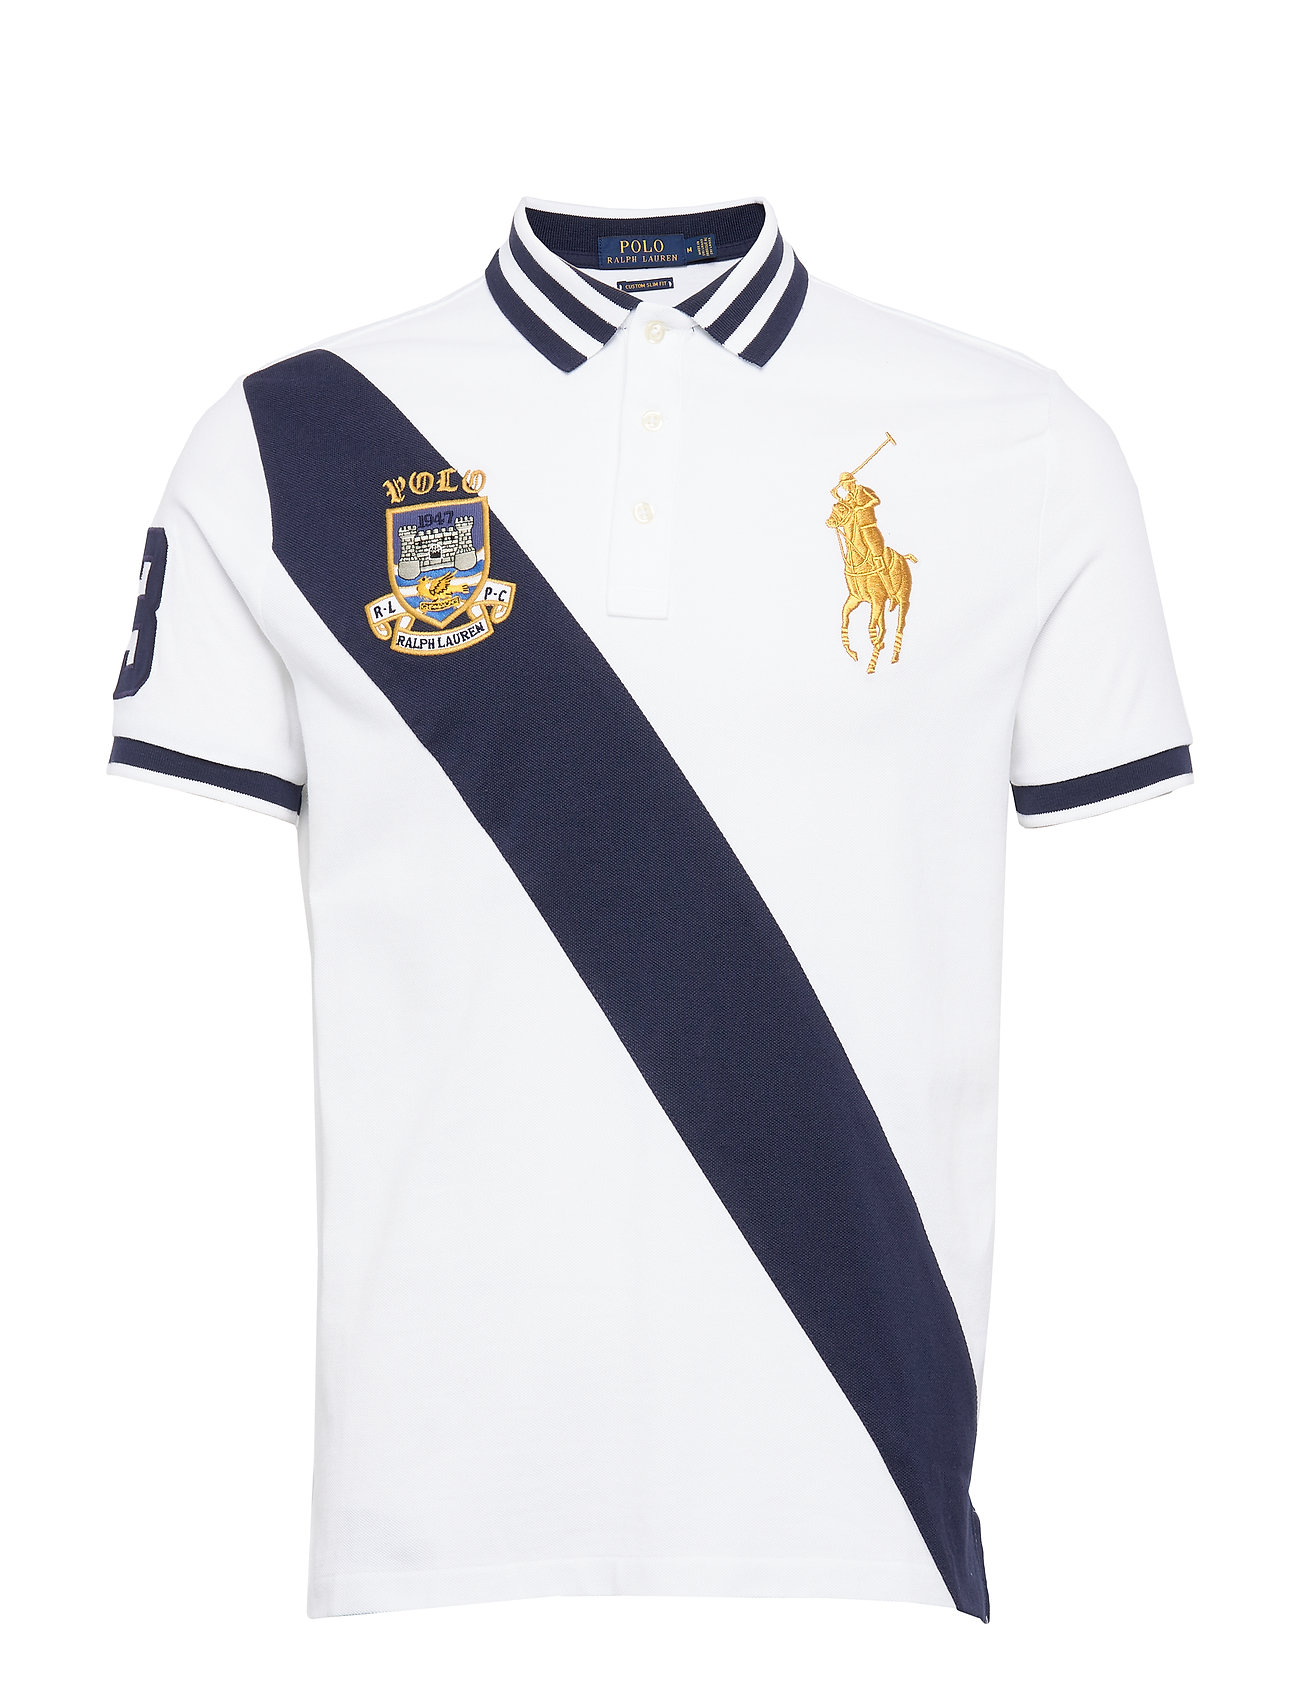 Polo Ralph Lauren Custom Slim Fit Mesh Polo - WHITE